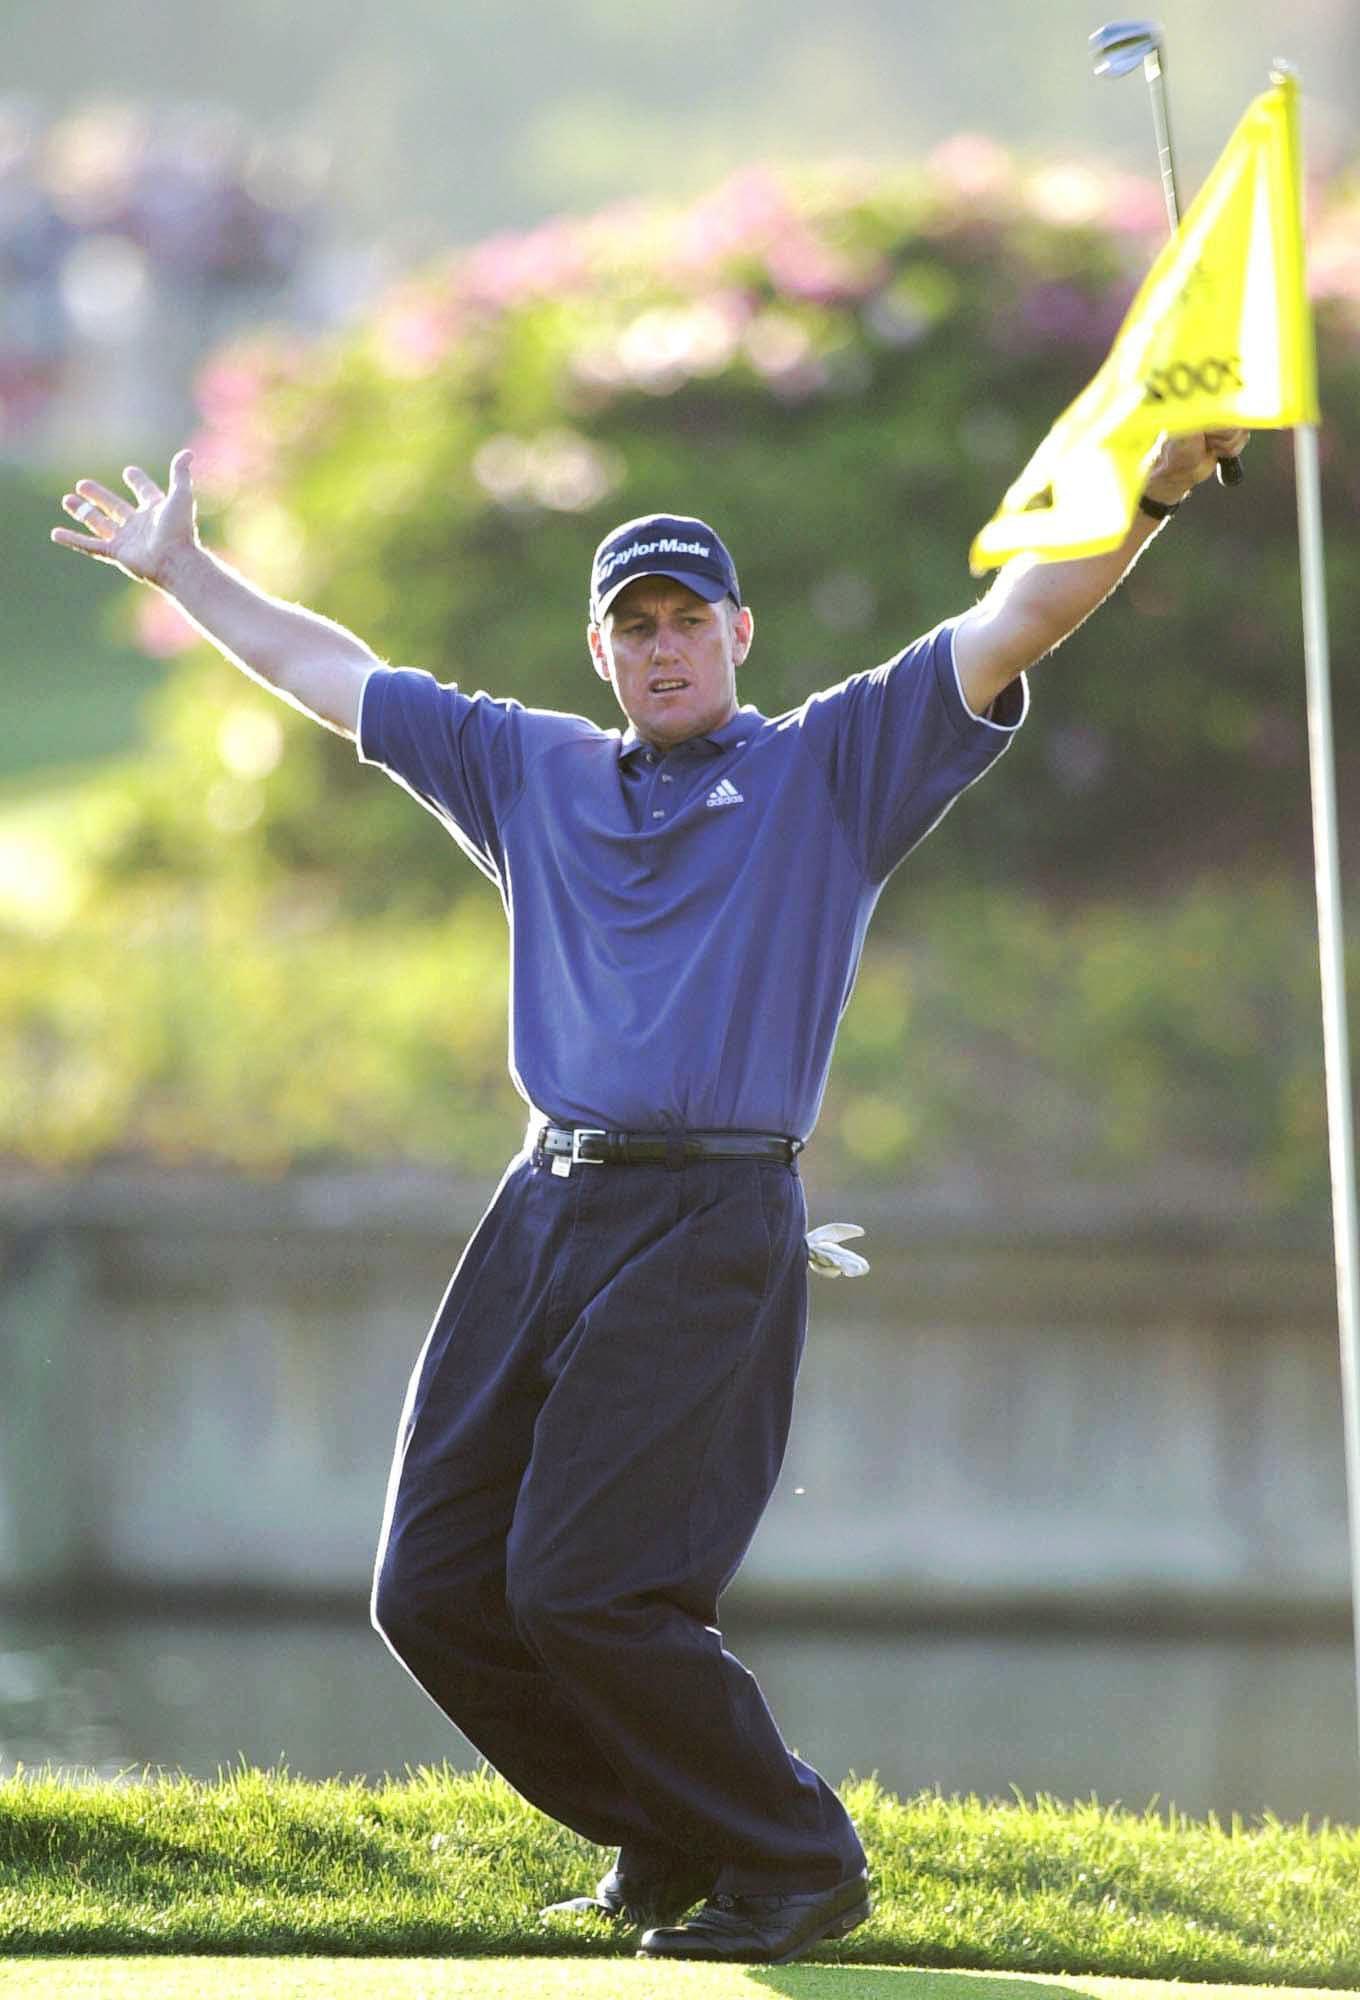 12. 2002: Perks' fantastic finish